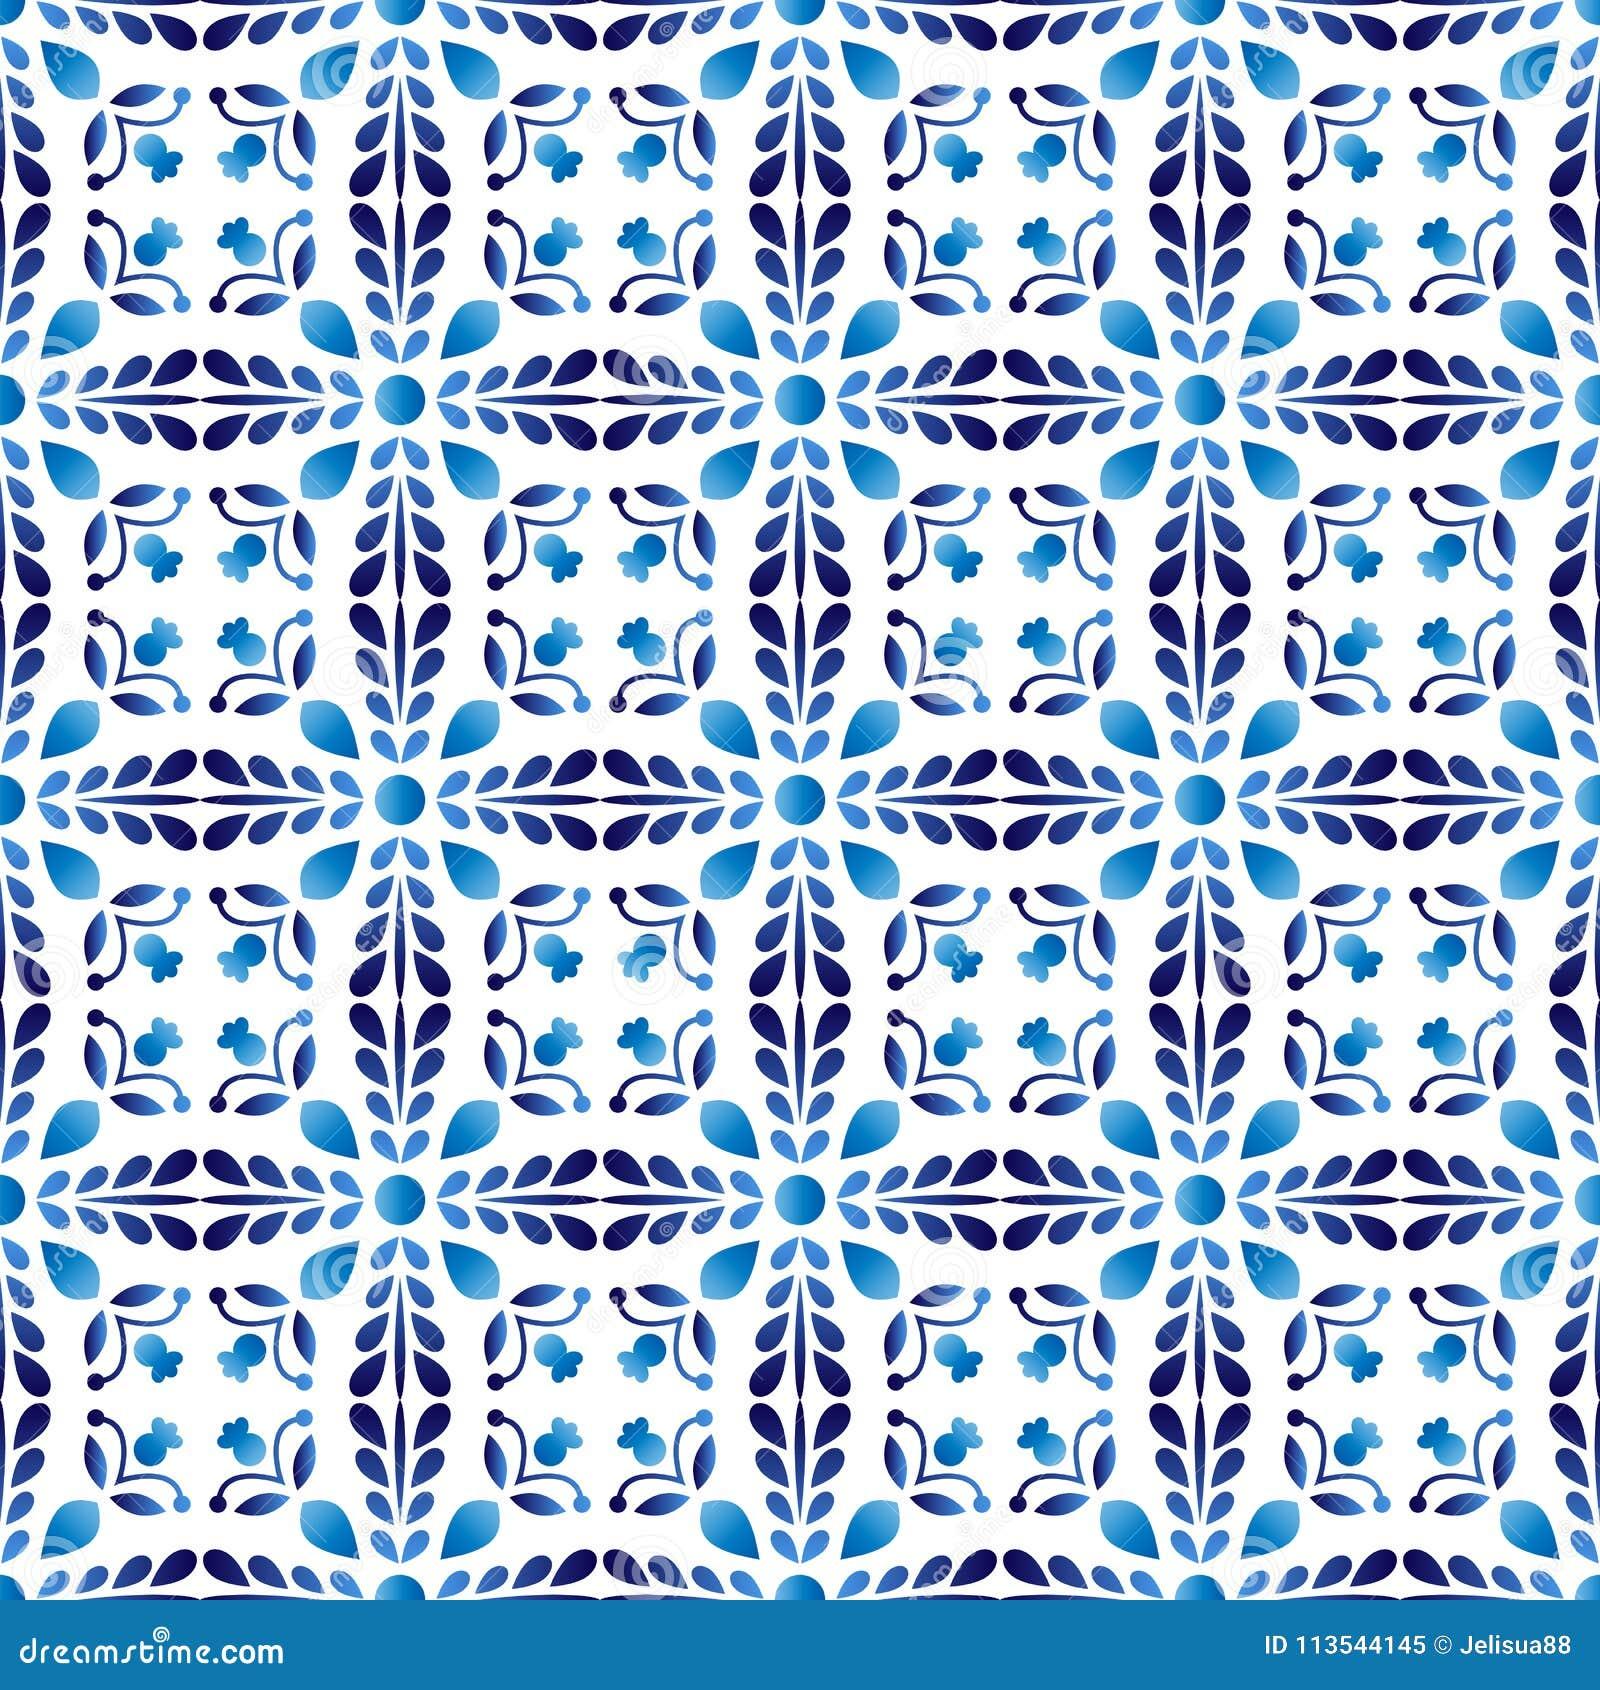 Ceramic Tile Pattern. Islamic, Indian, Arabic Motifs. Damask Sea ...